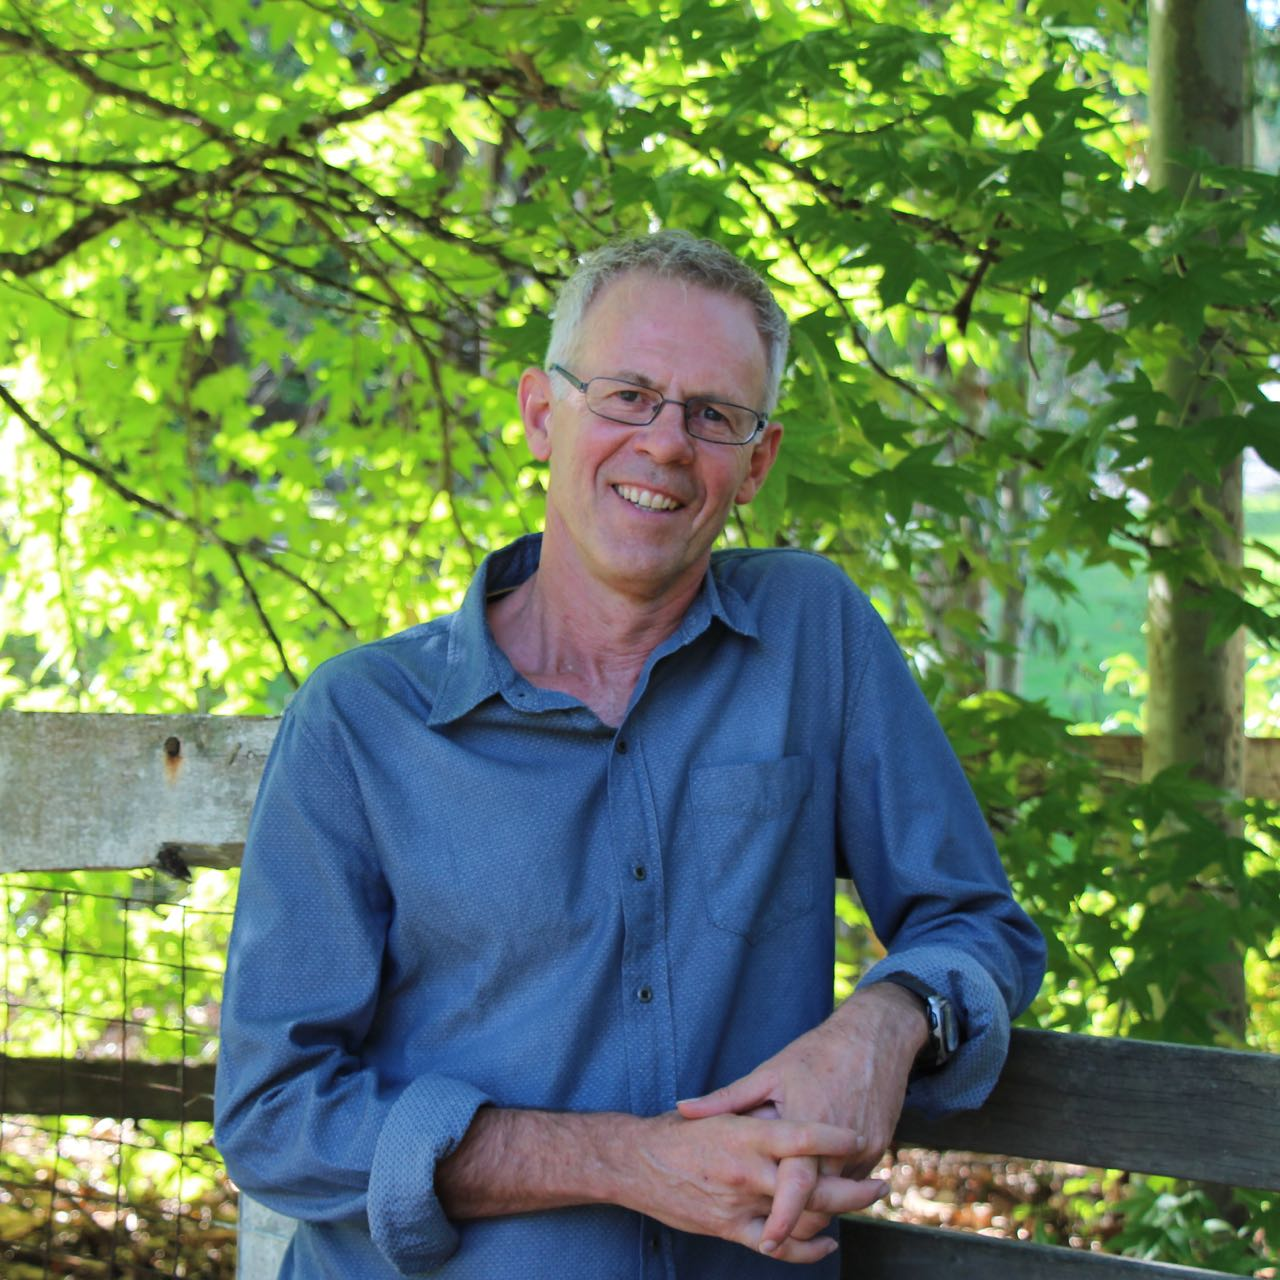 Jonathan Gould counsellor - headshot portrait